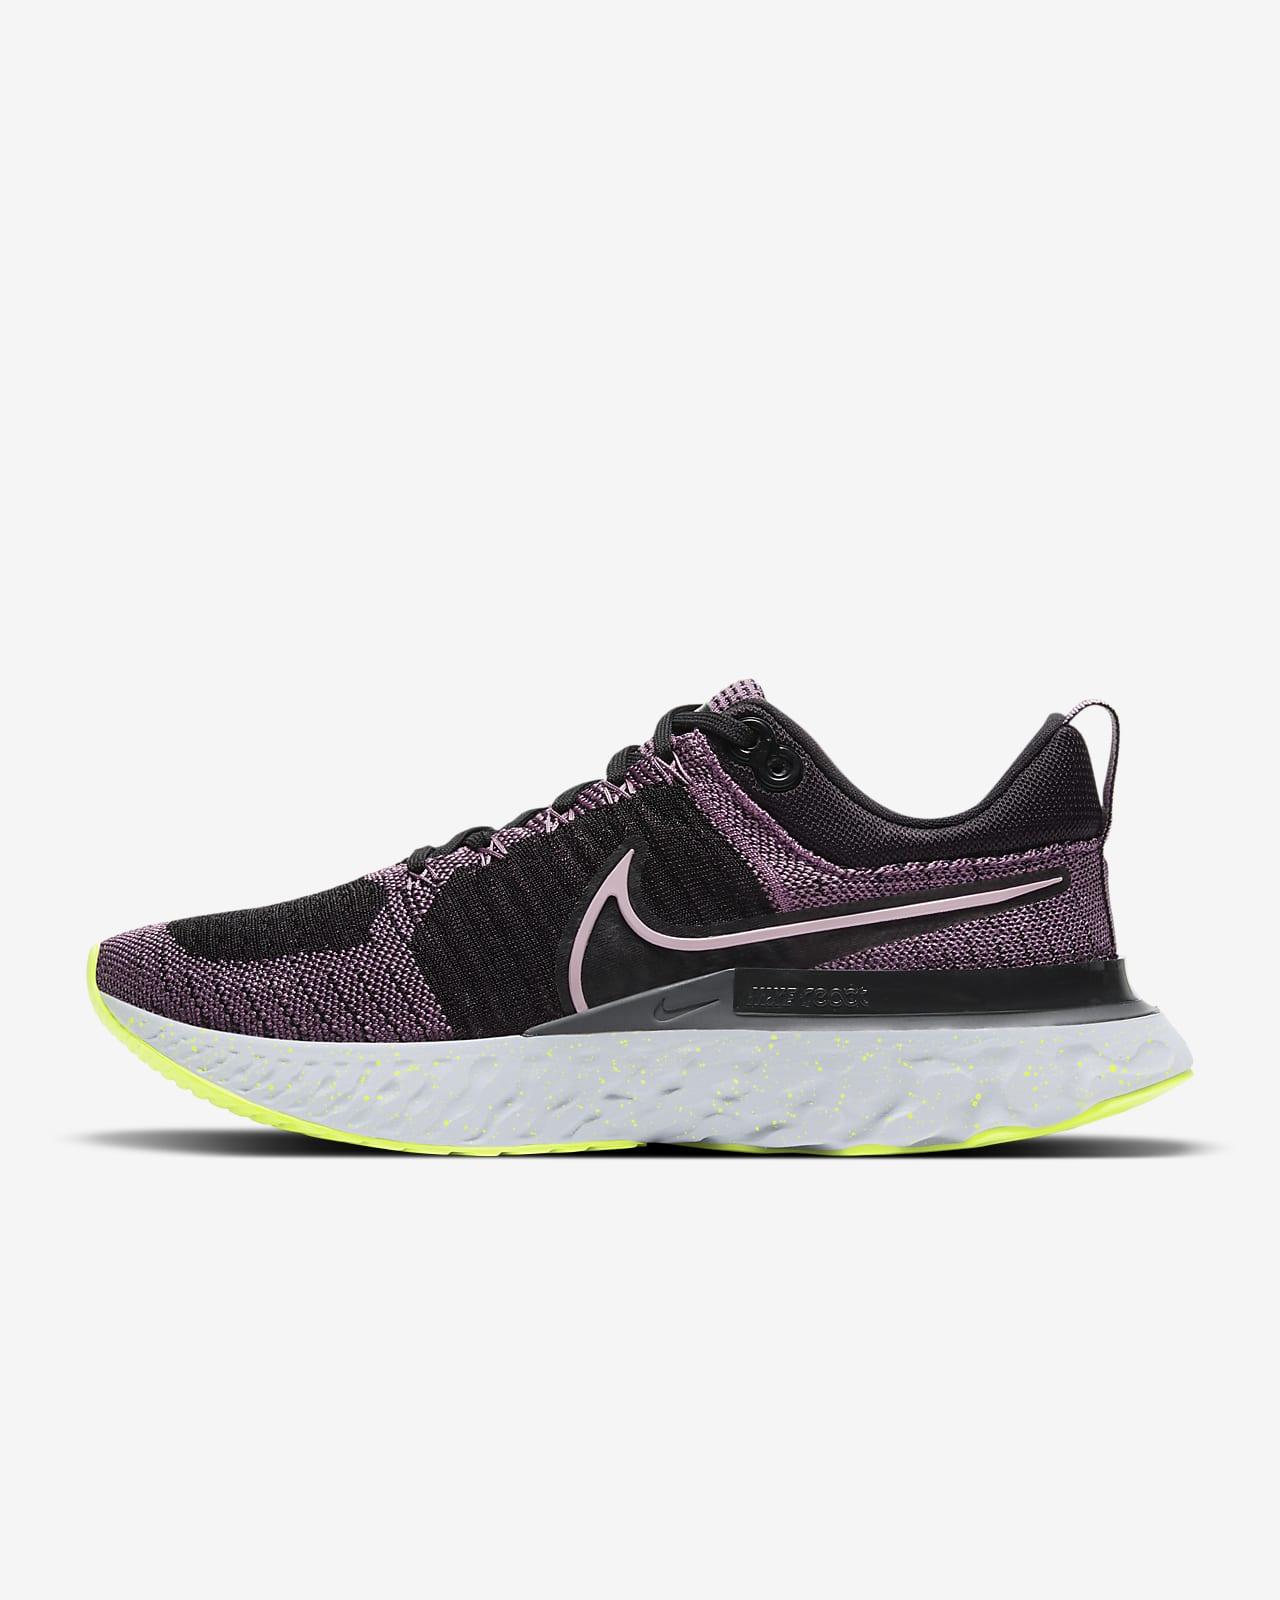 Chaussure de running sur route Nike React Infinity Run Flyknit2 pour Femme